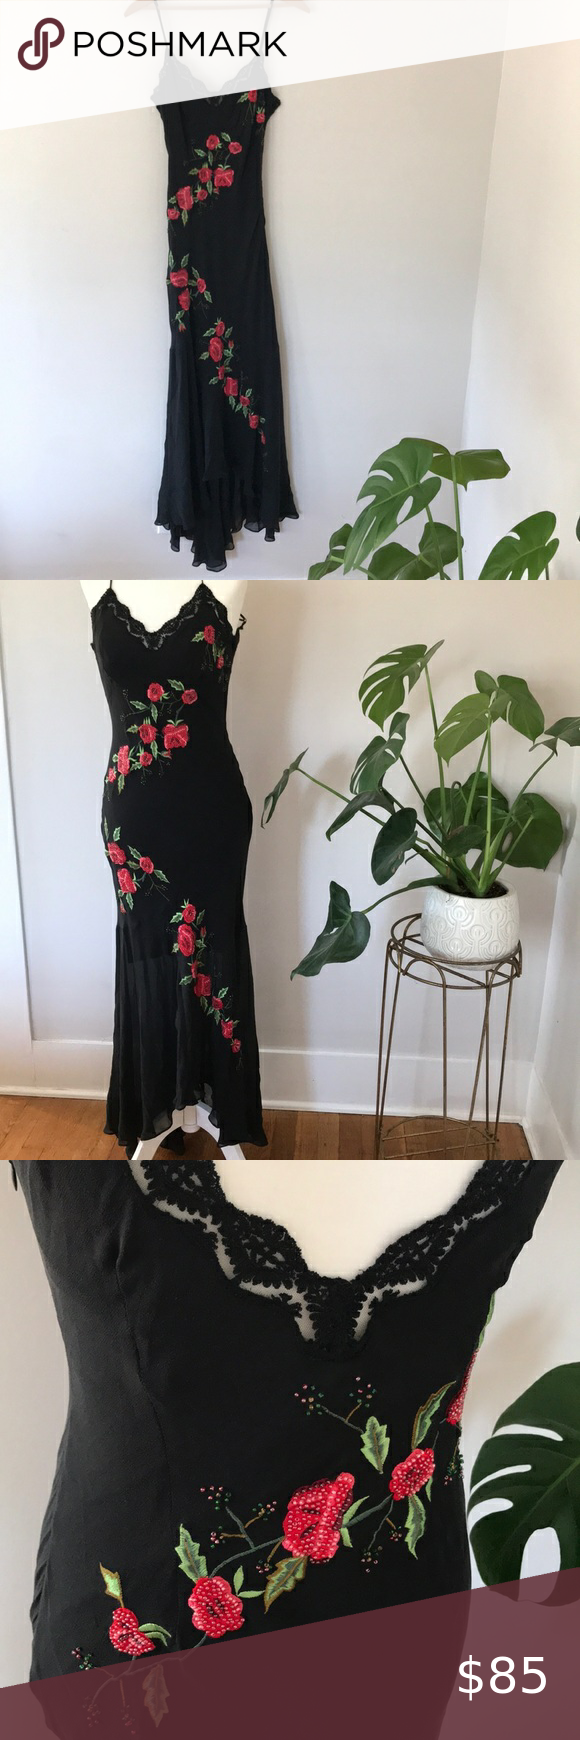 Vintage Cache Silk Floral Dress Silk Floral Dress Floral Dress Black Silk Dress [ 1740 x 580 Pixel ]